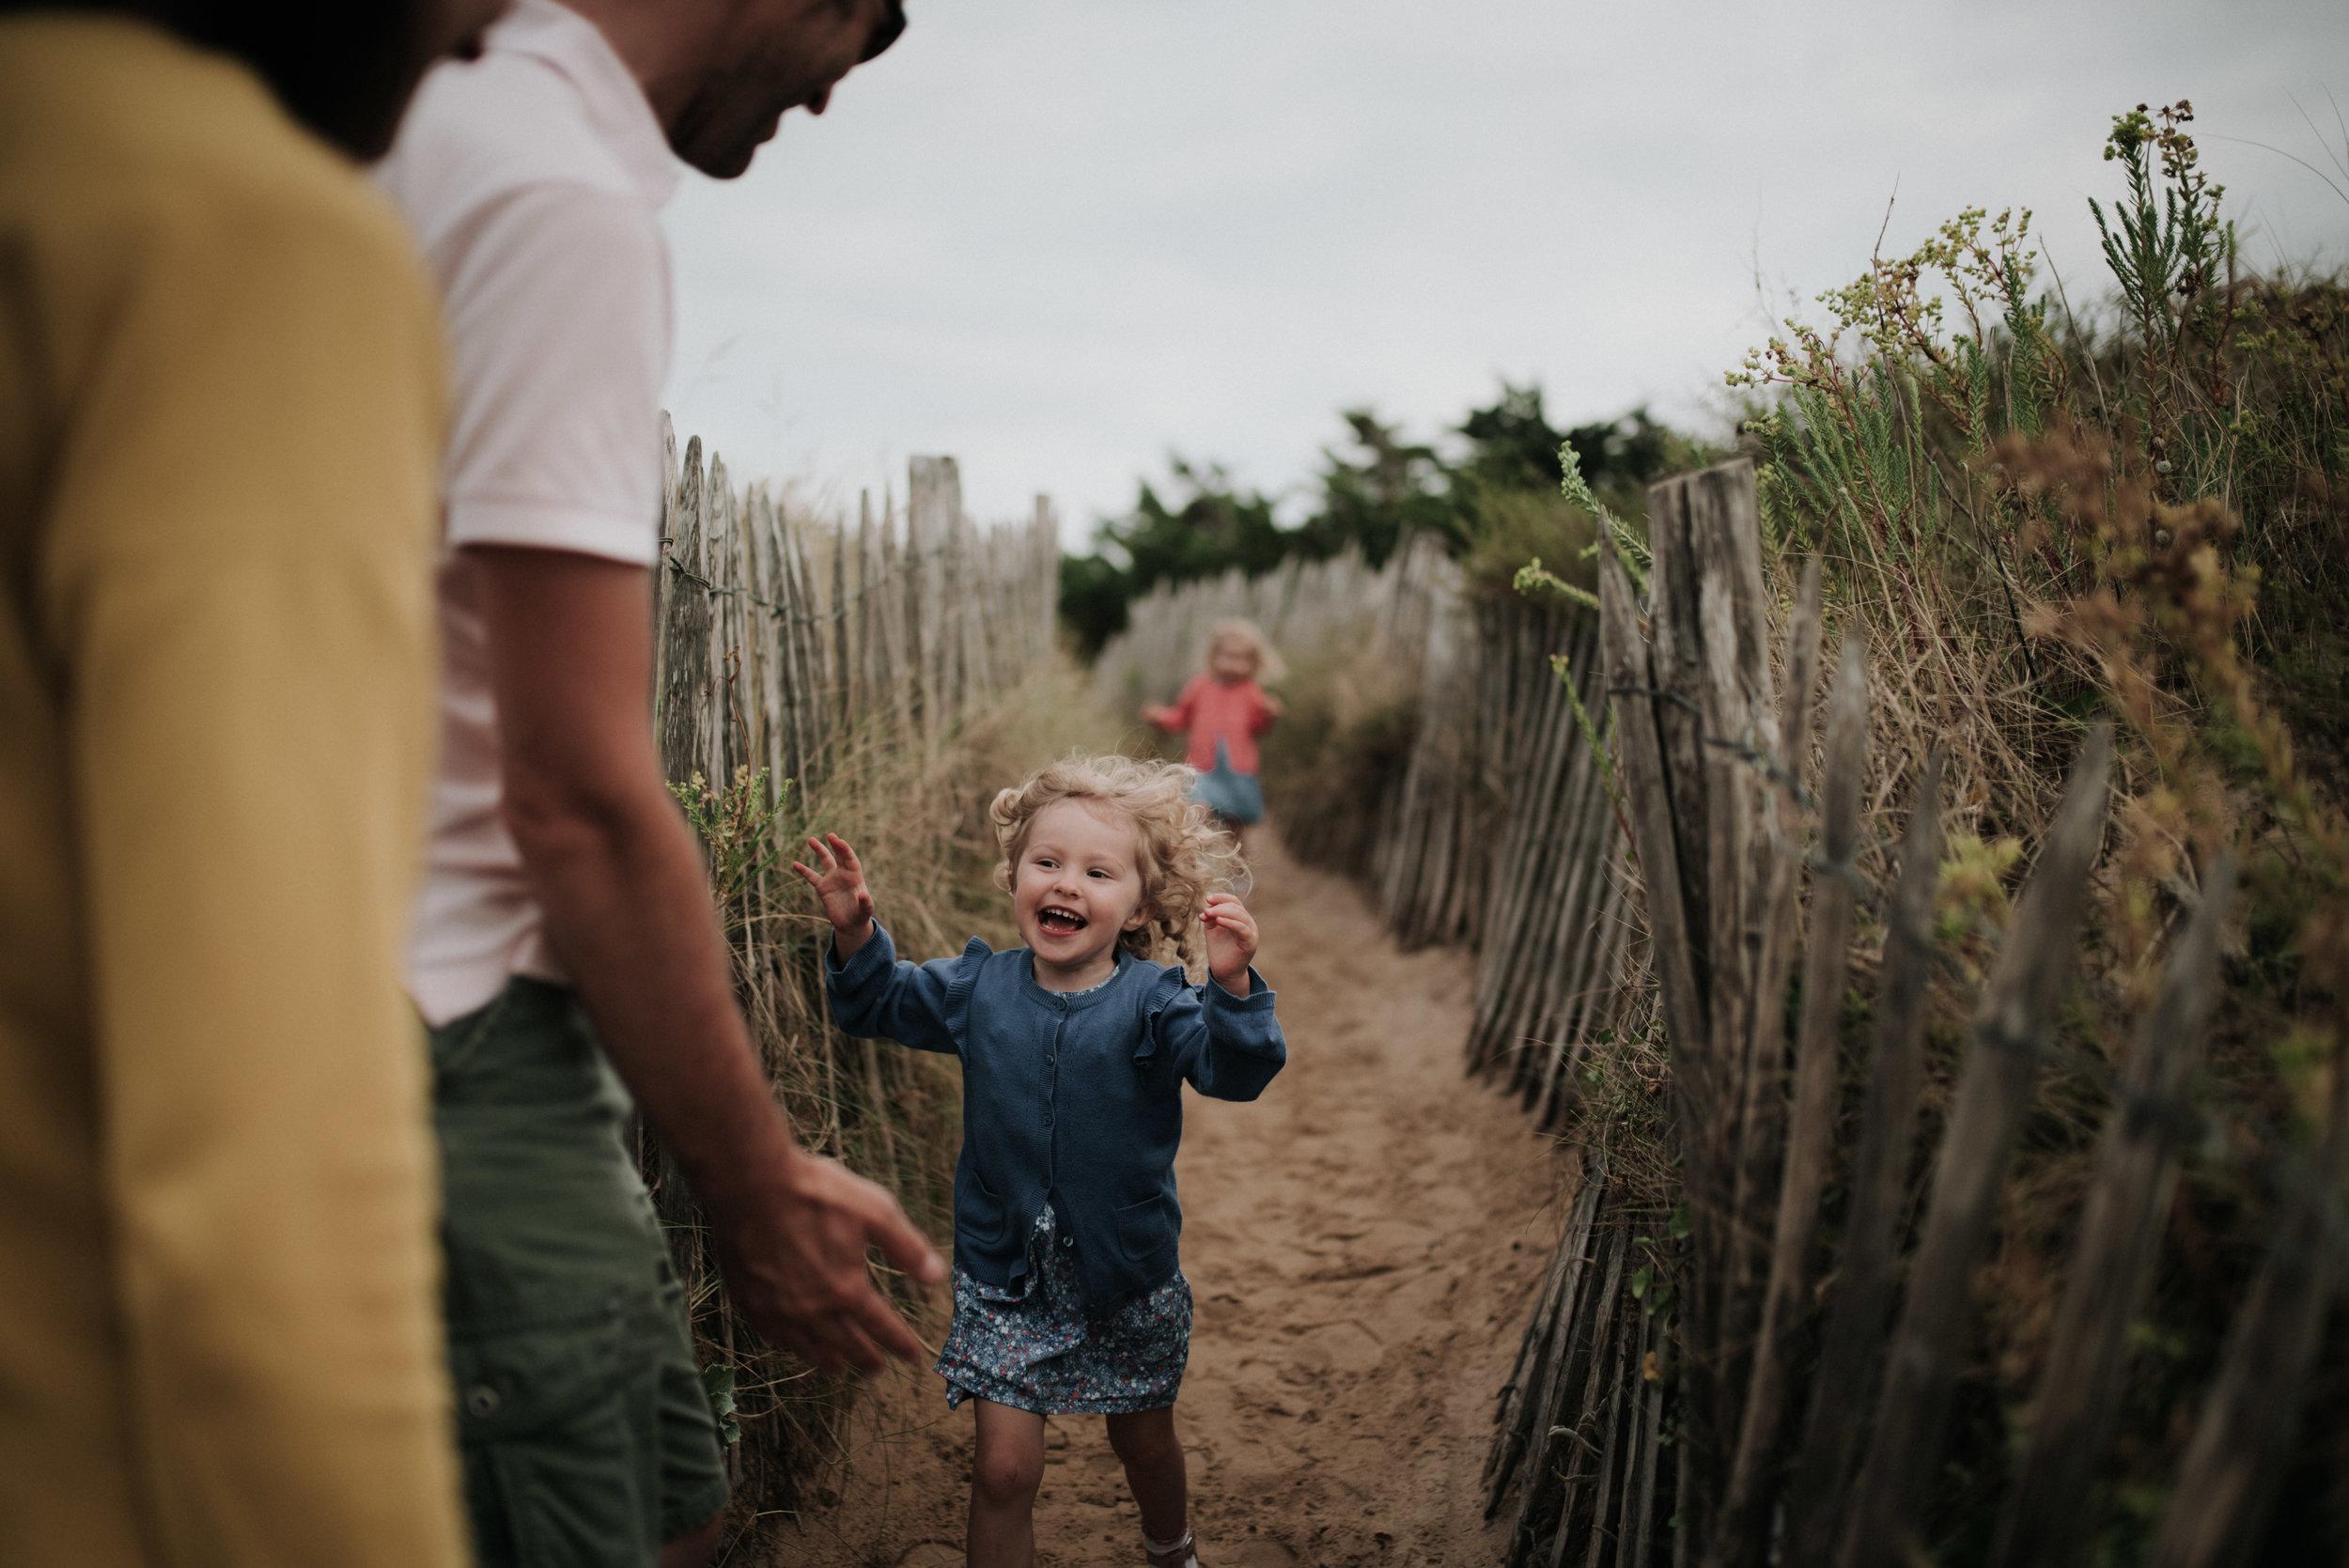 Léa-Fery-photographe-professionnel-bretagne-famille